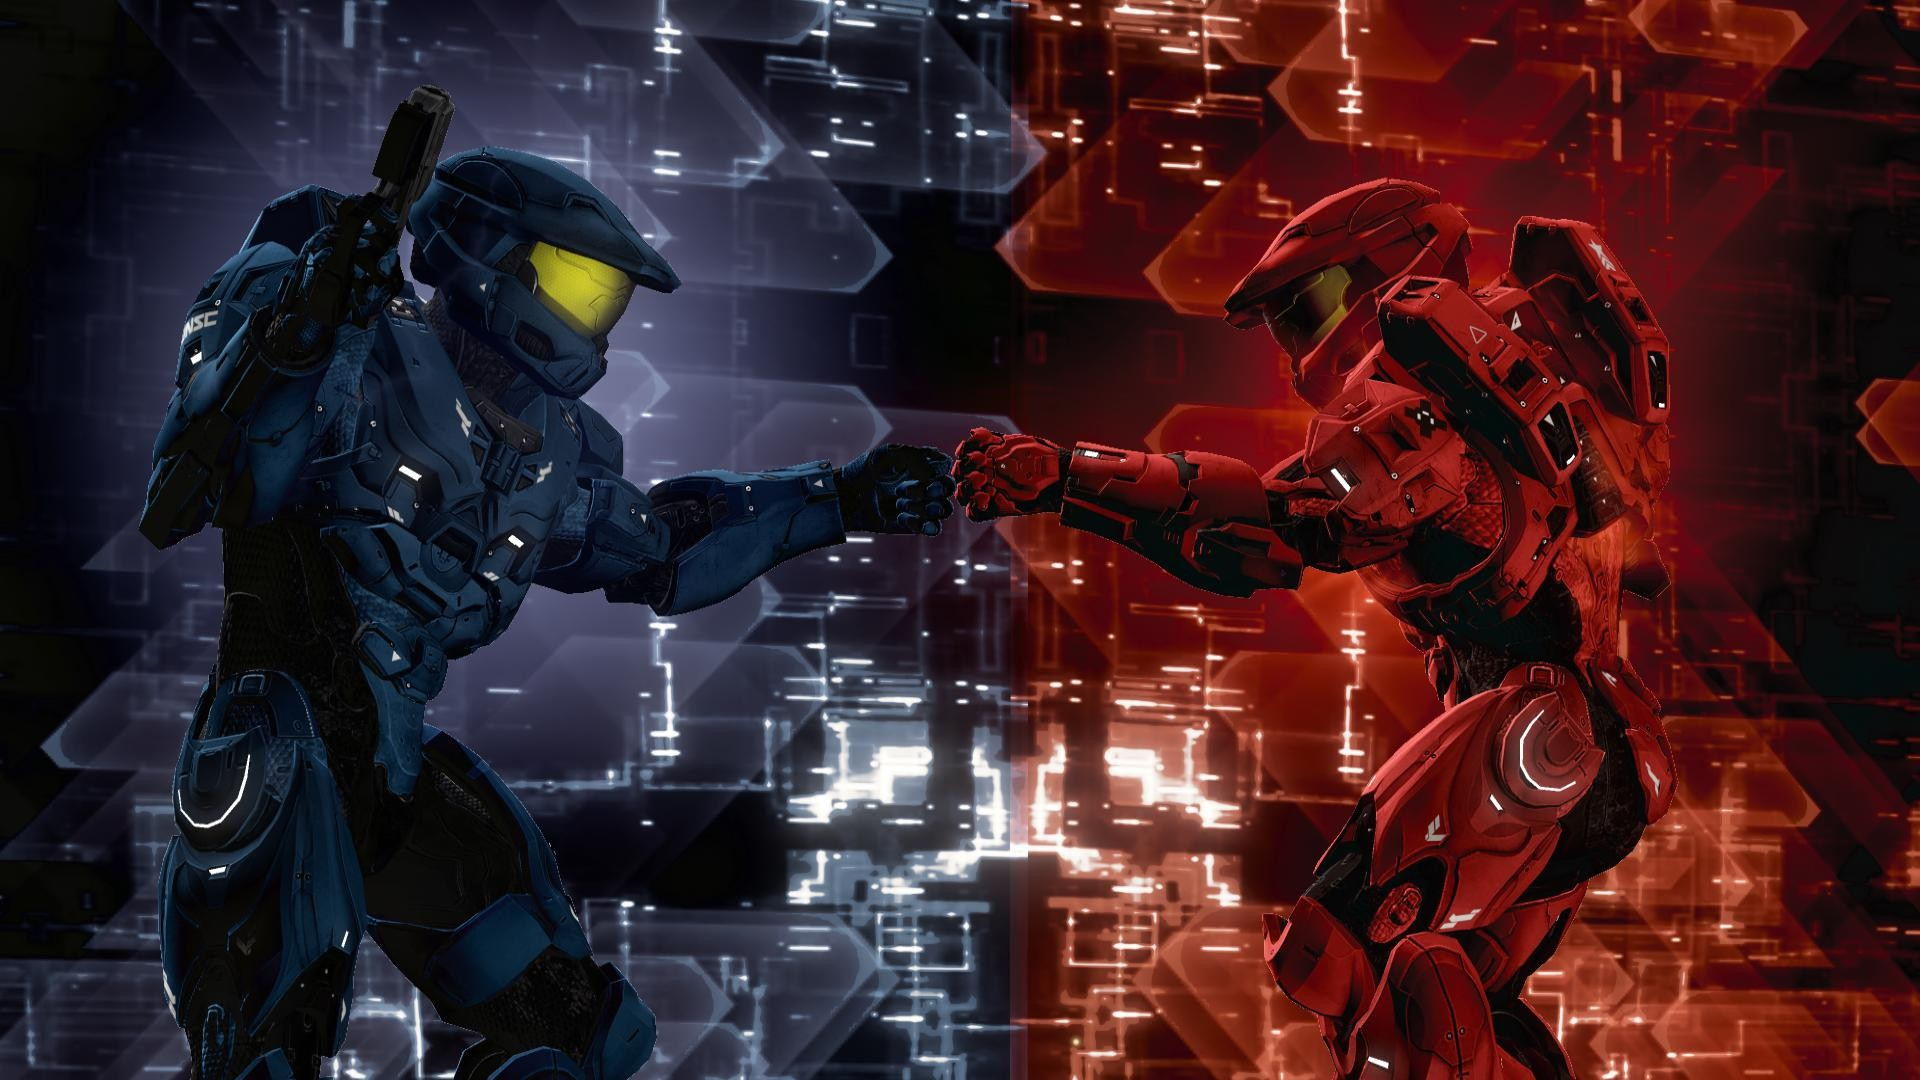 High Resolution Best Game Red vs Blue Wallpaper HD 3 Full Size …    Download Wallpaper   Pinterest   Red vs blue, Blue wallpapers and 3d  wallpaper